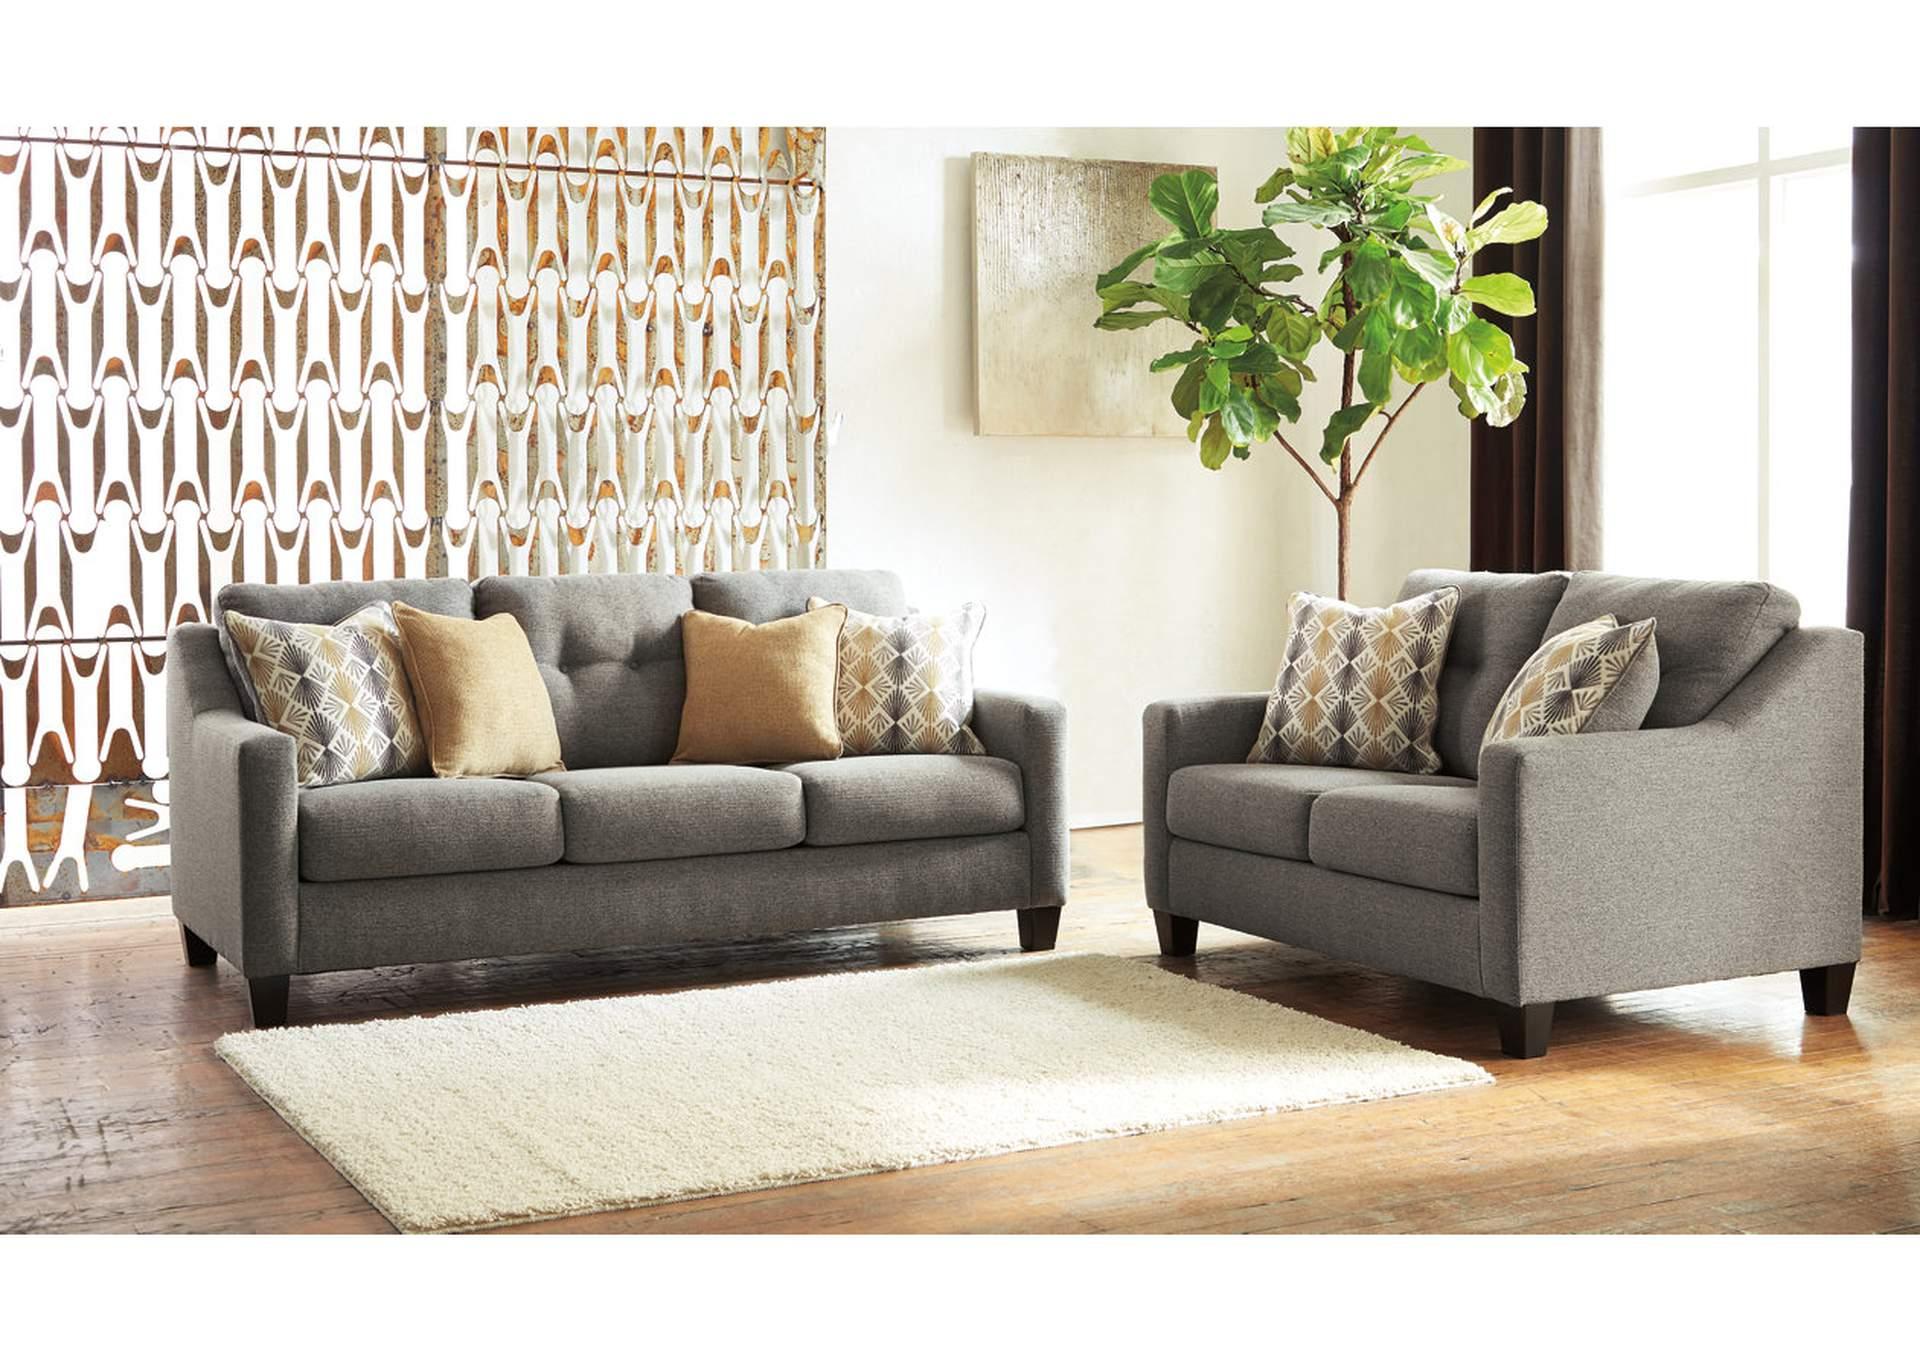 Daylon Graphite Sofa U0026 Loveseat,Benchcraft